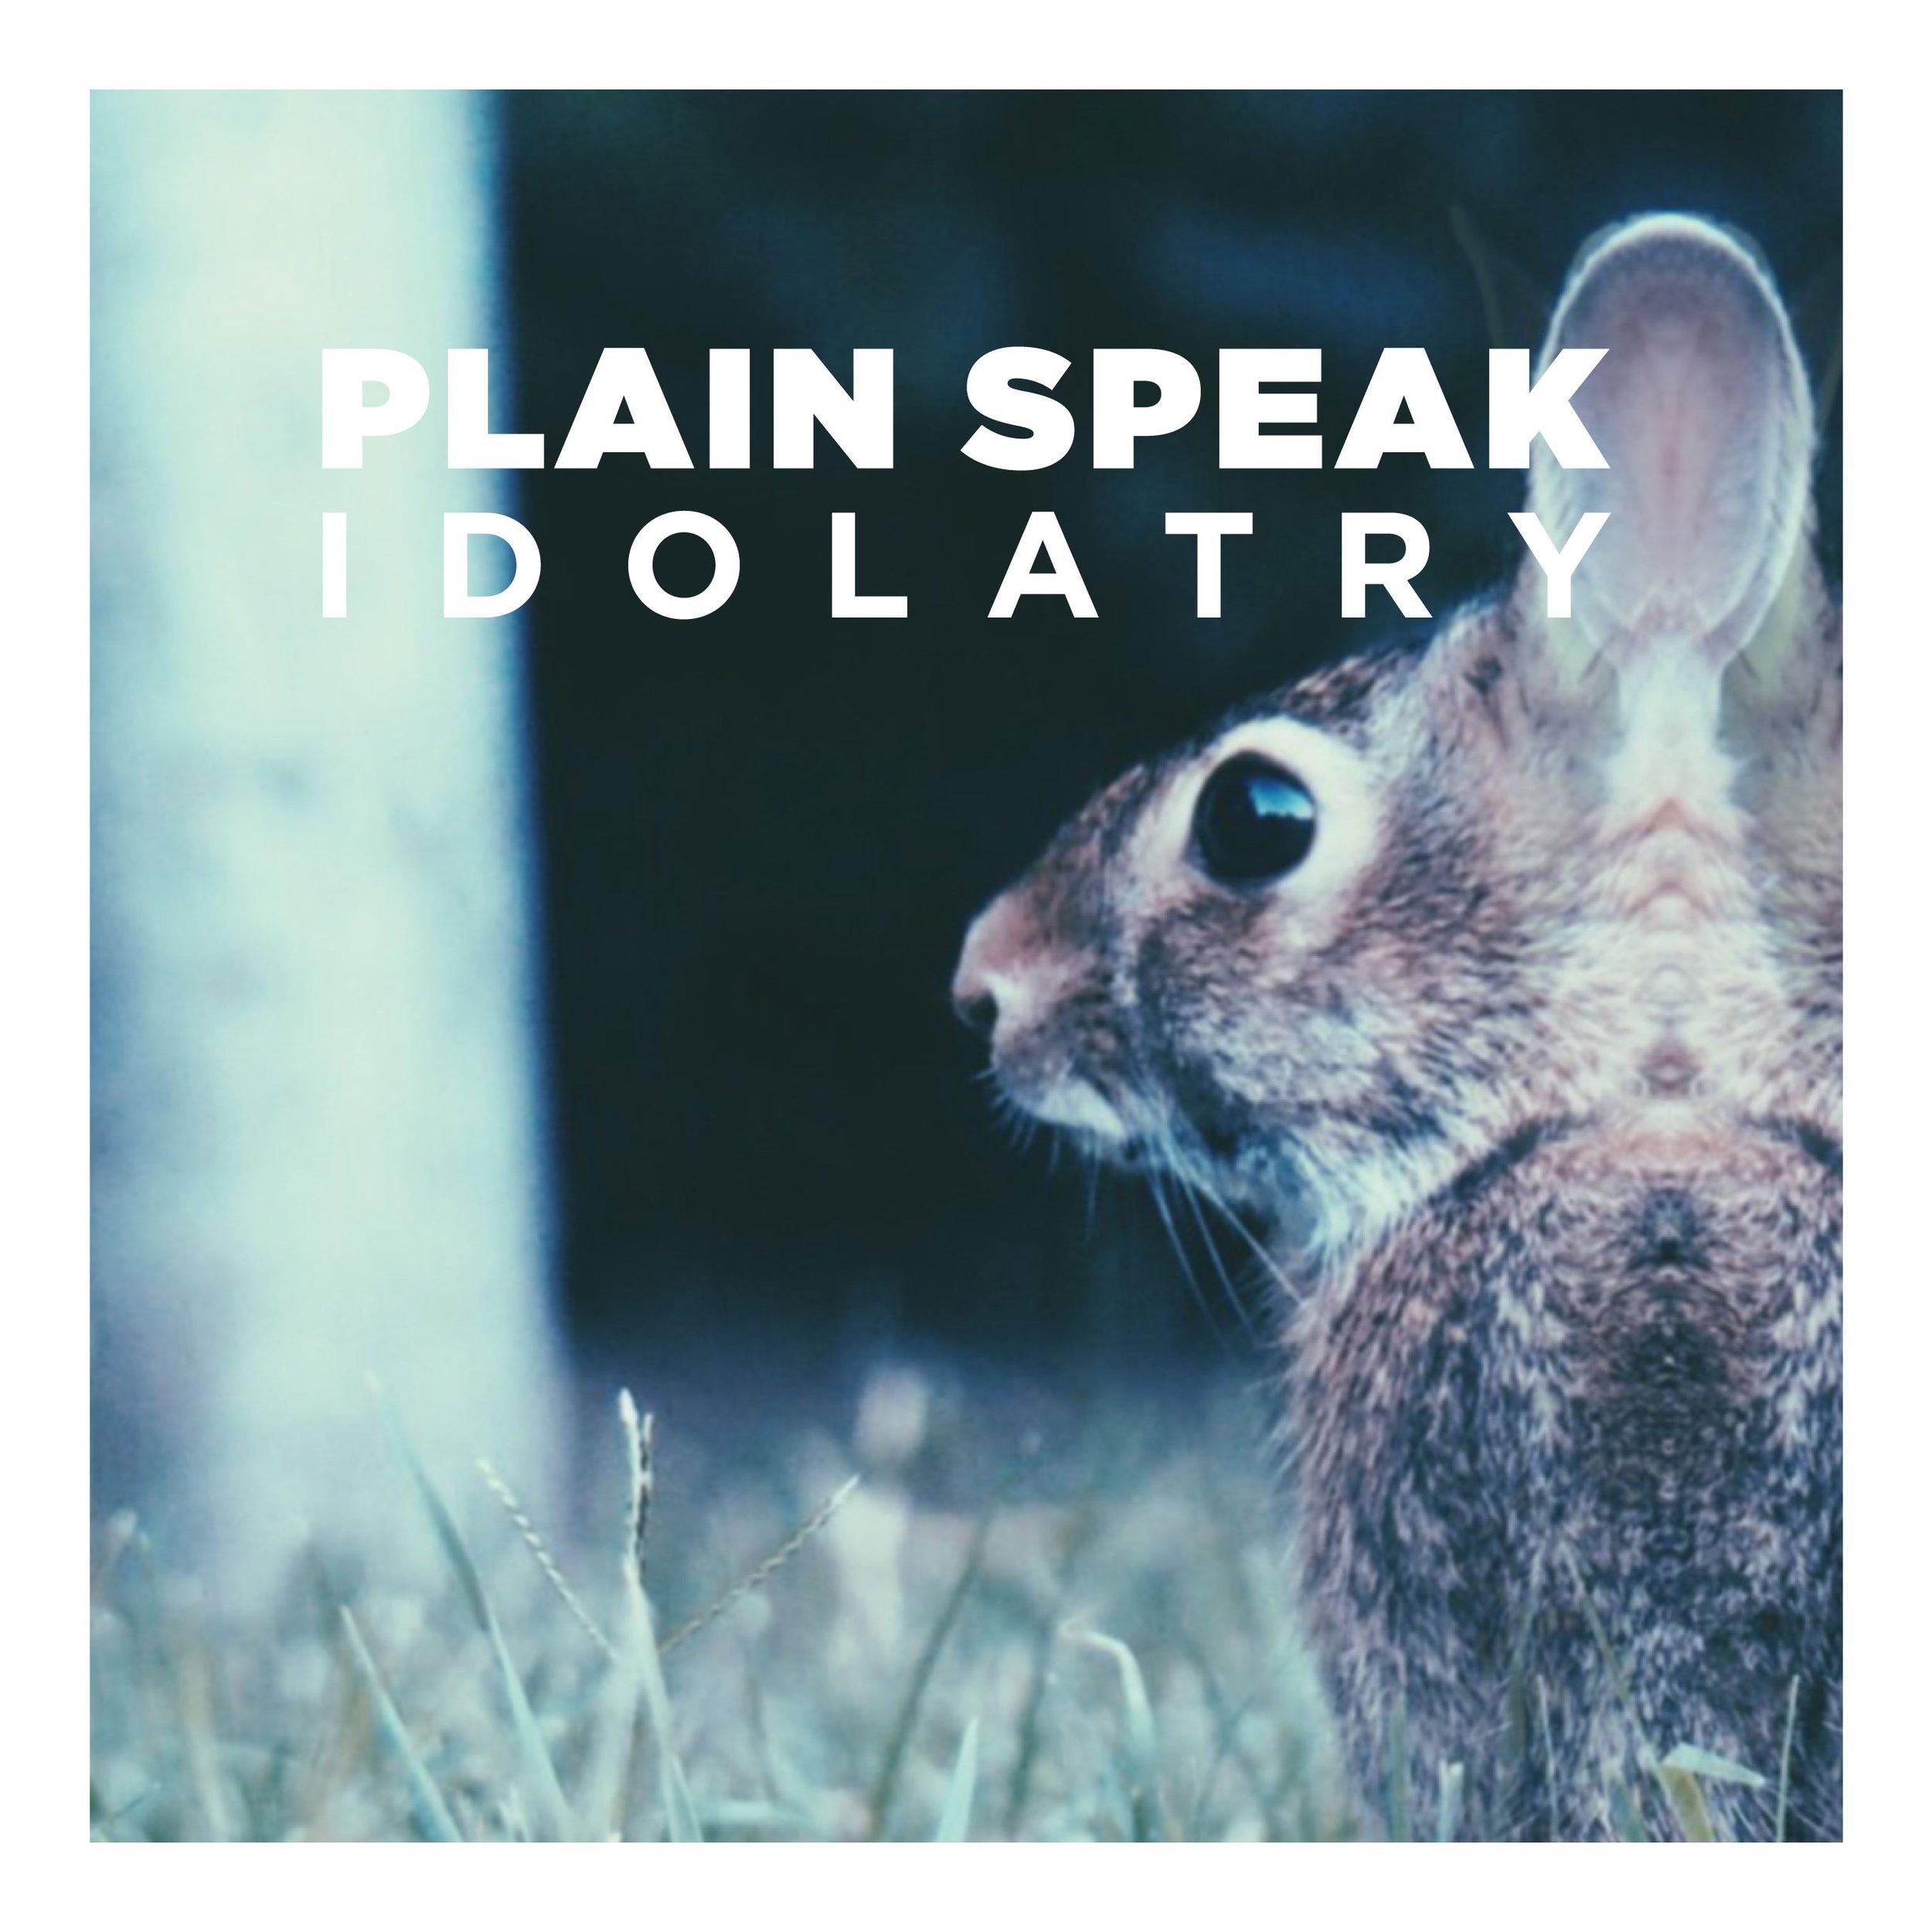 Plain-Speak---Cautionary-Animal---Mock-up-01.1-1.jpg